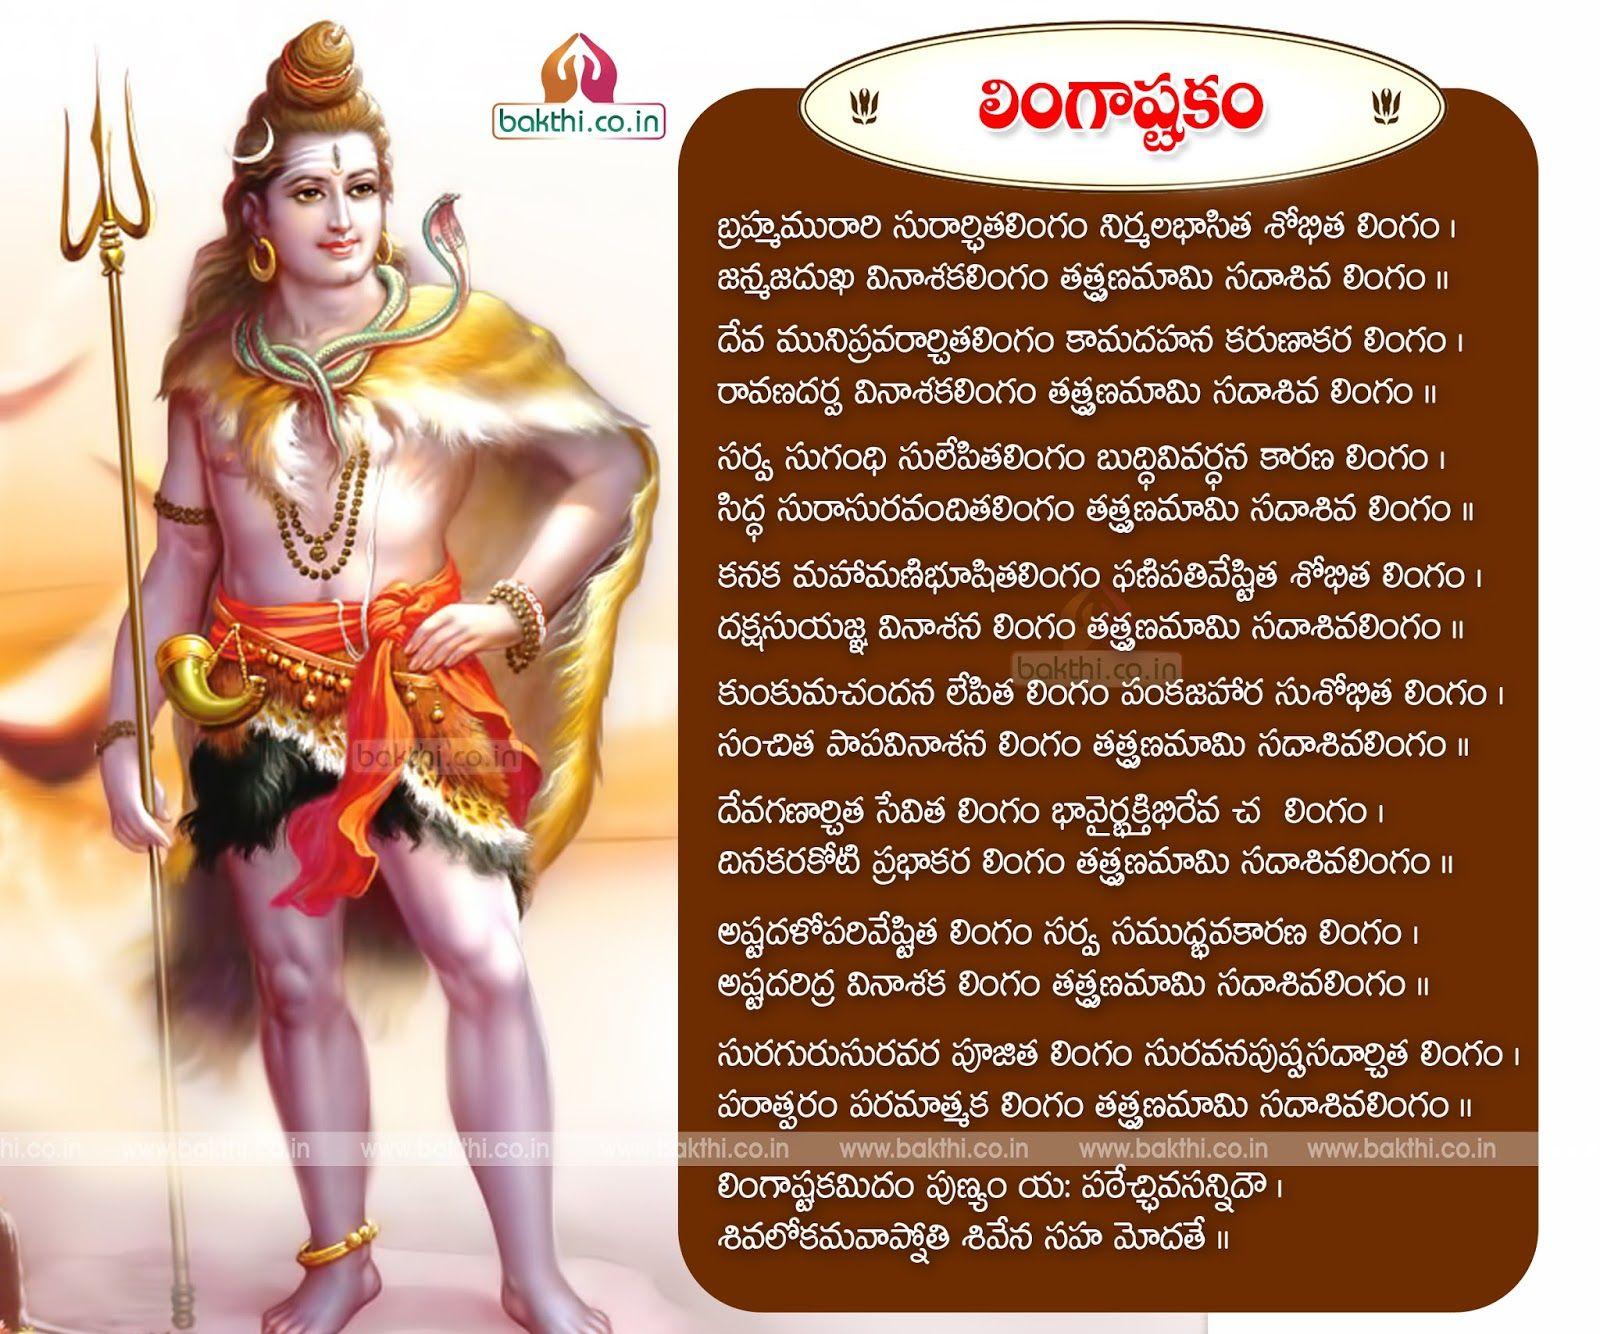 lingastakam in telugu language hd wallpaper free online bakthi co injpg 16001334 lingastakam in telugu language hd wallpaper free online bakthi co in